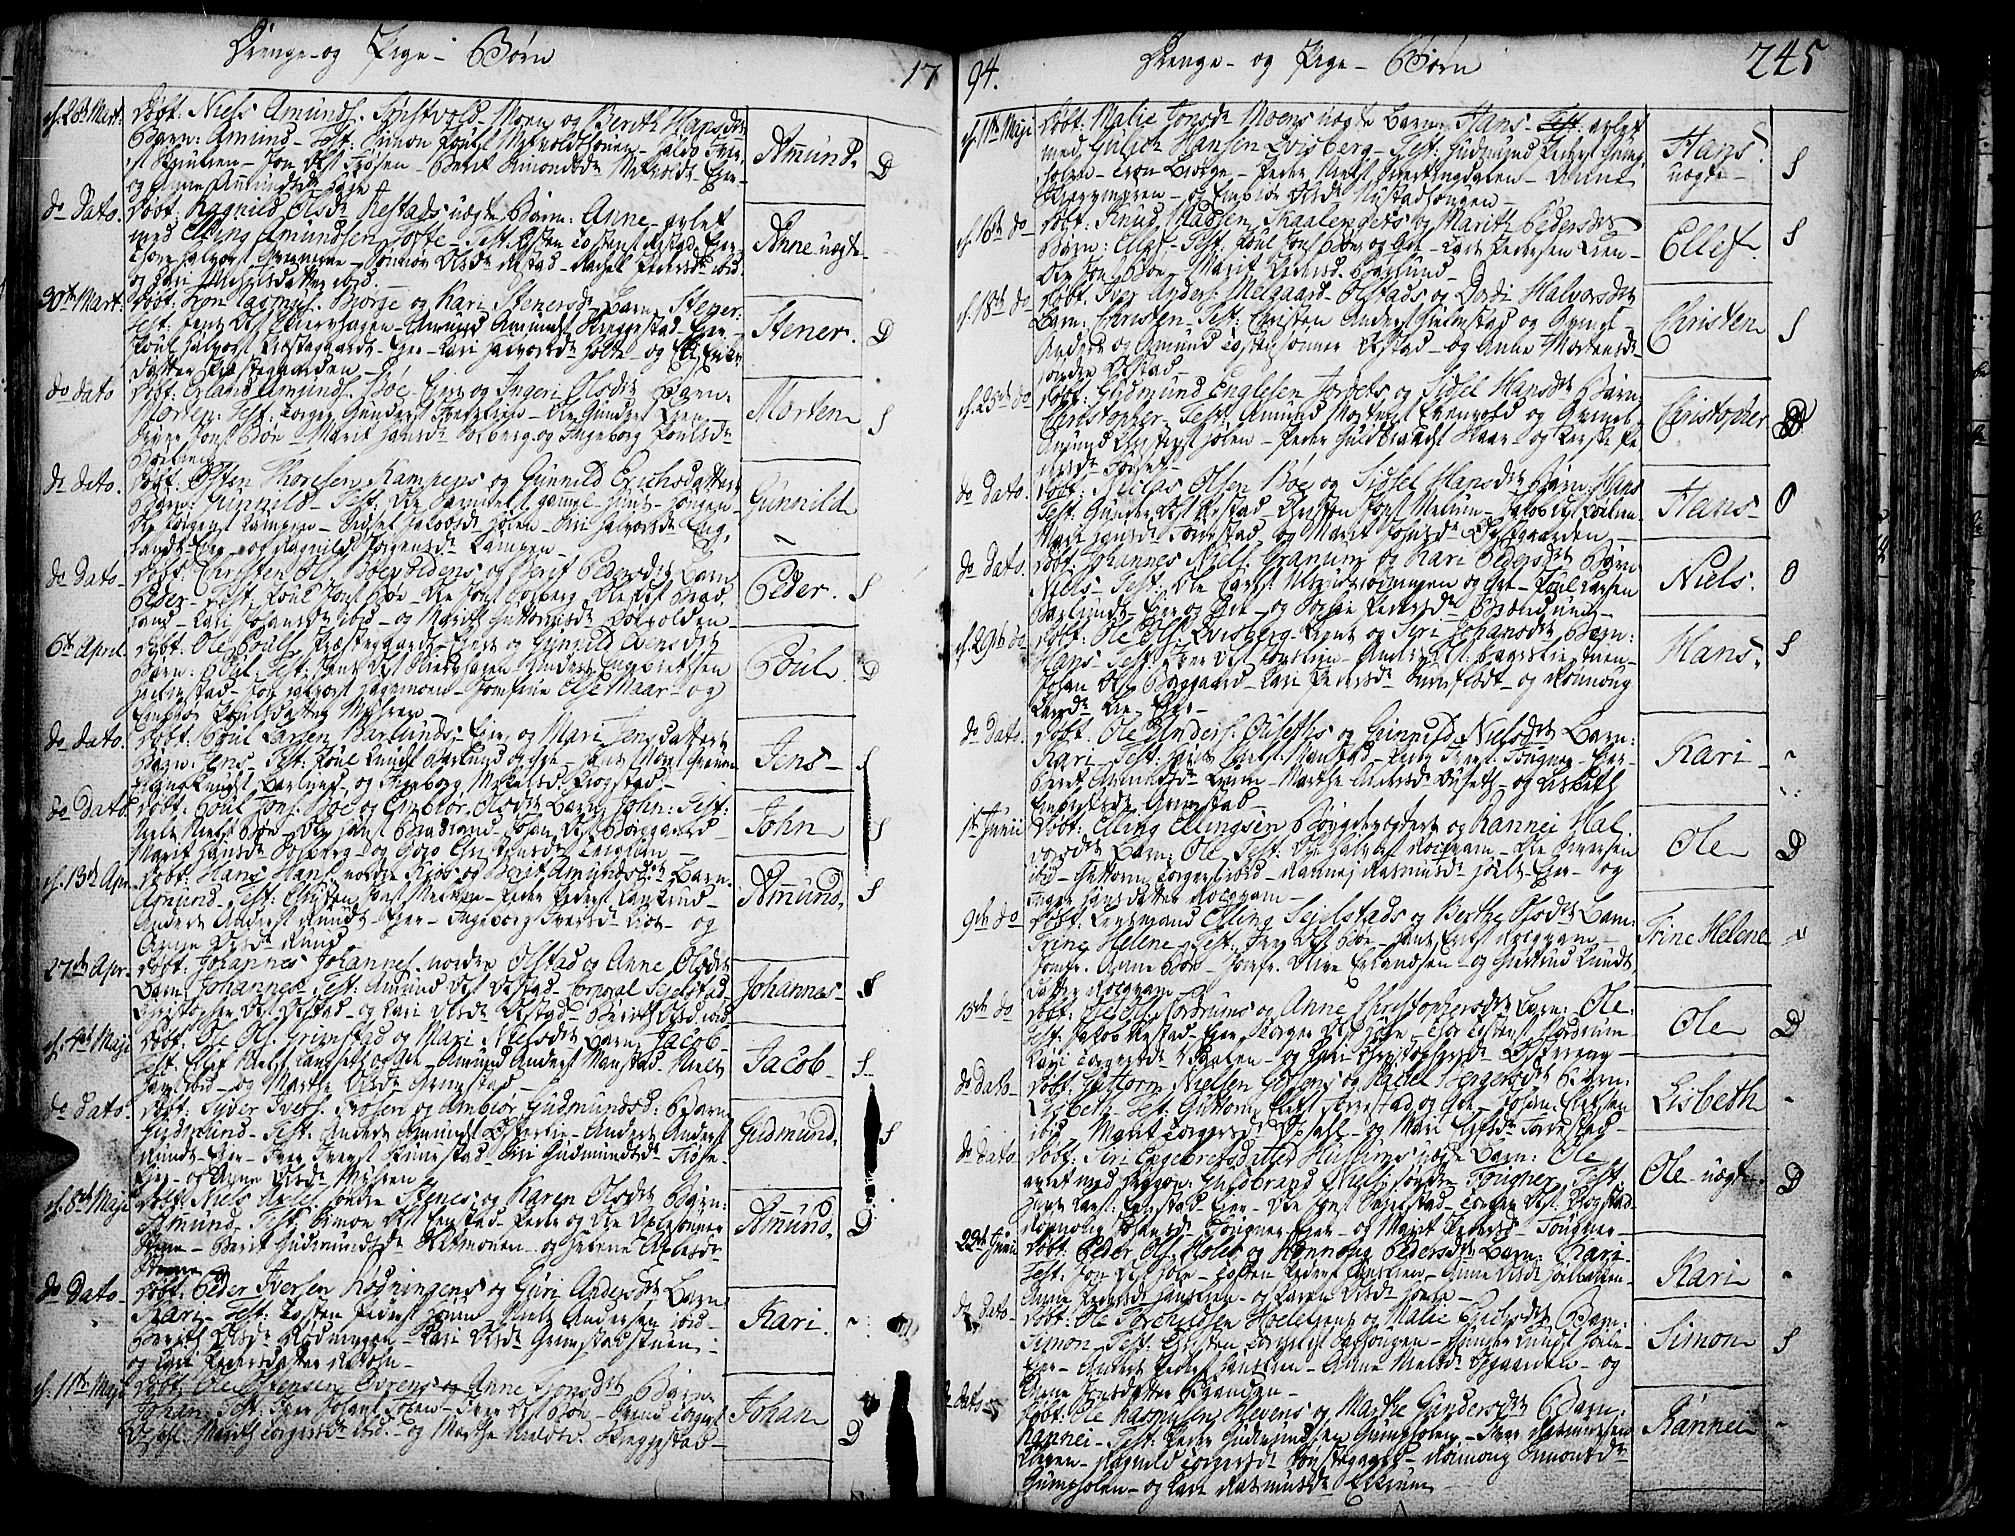 SAH, Gausdal prestekontor, Ministerialbok nr. 3, 1758-1809, s. 245